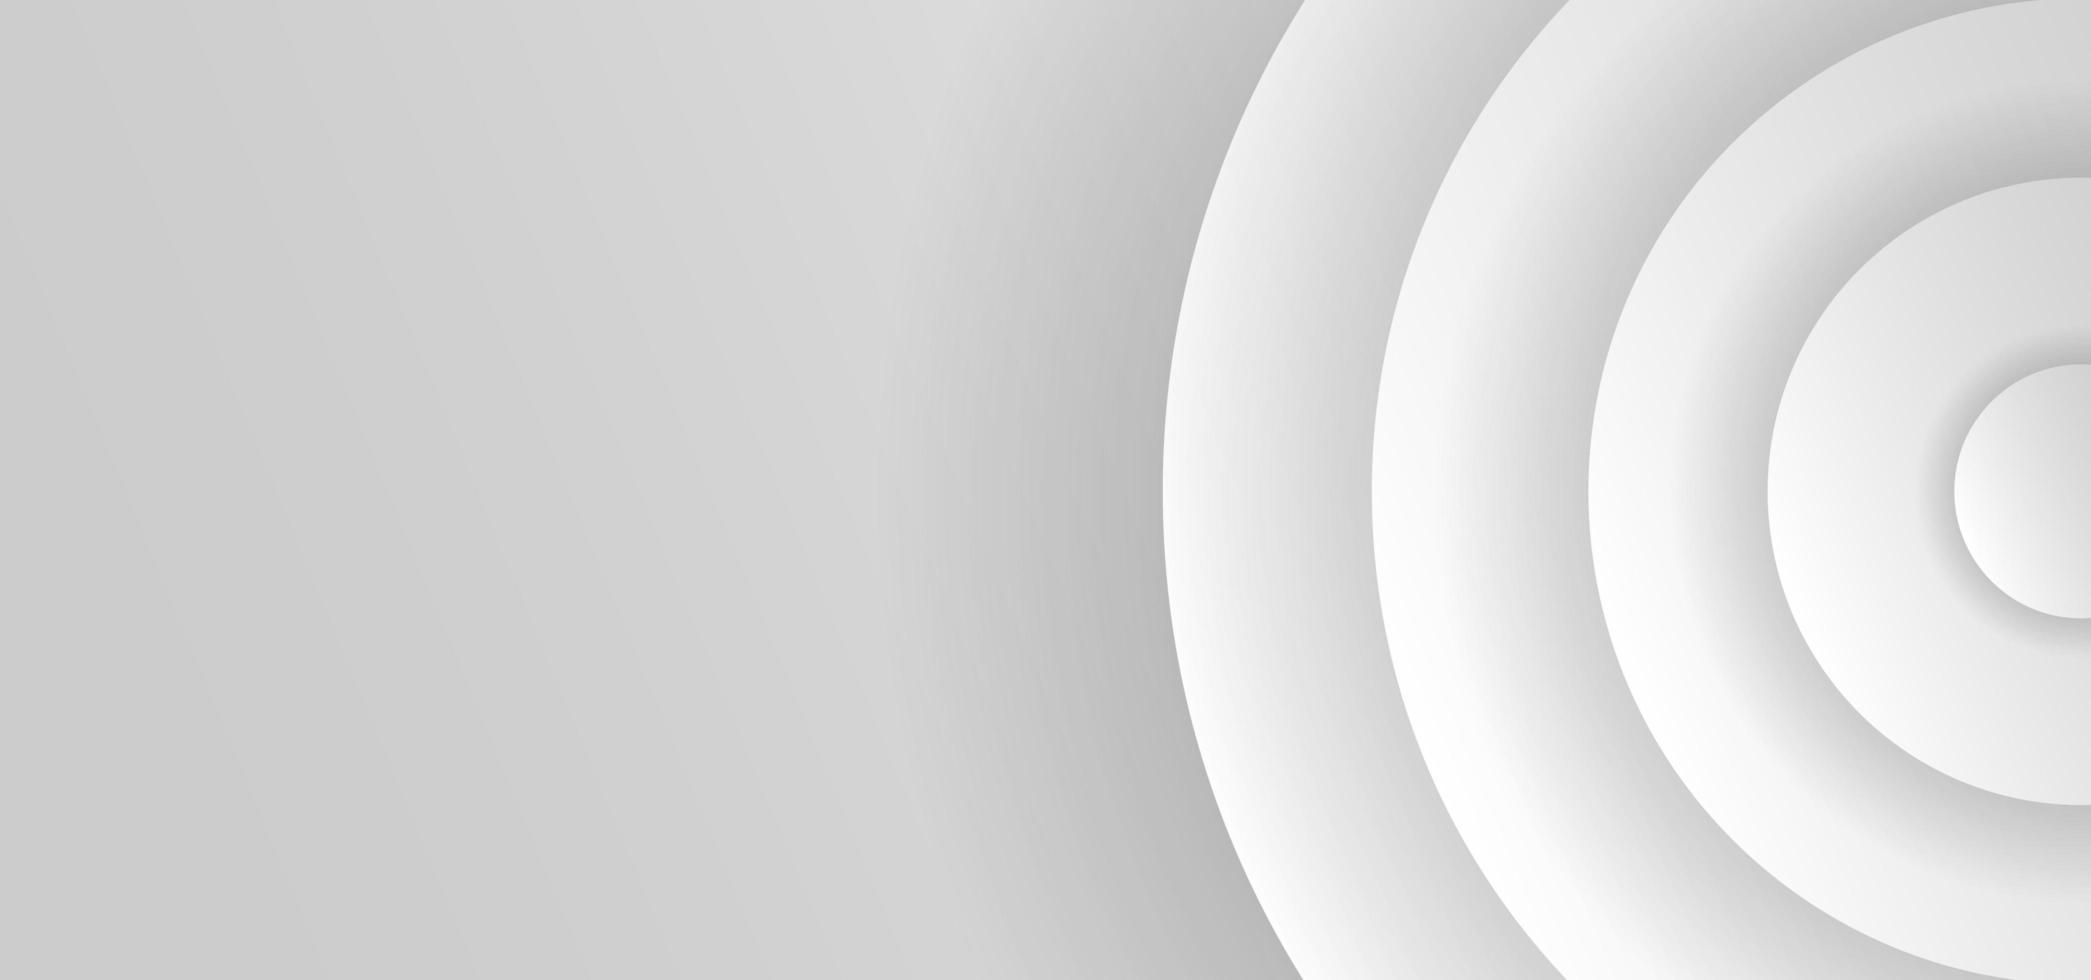 vit rund papper klippa banner bakgrund vektor